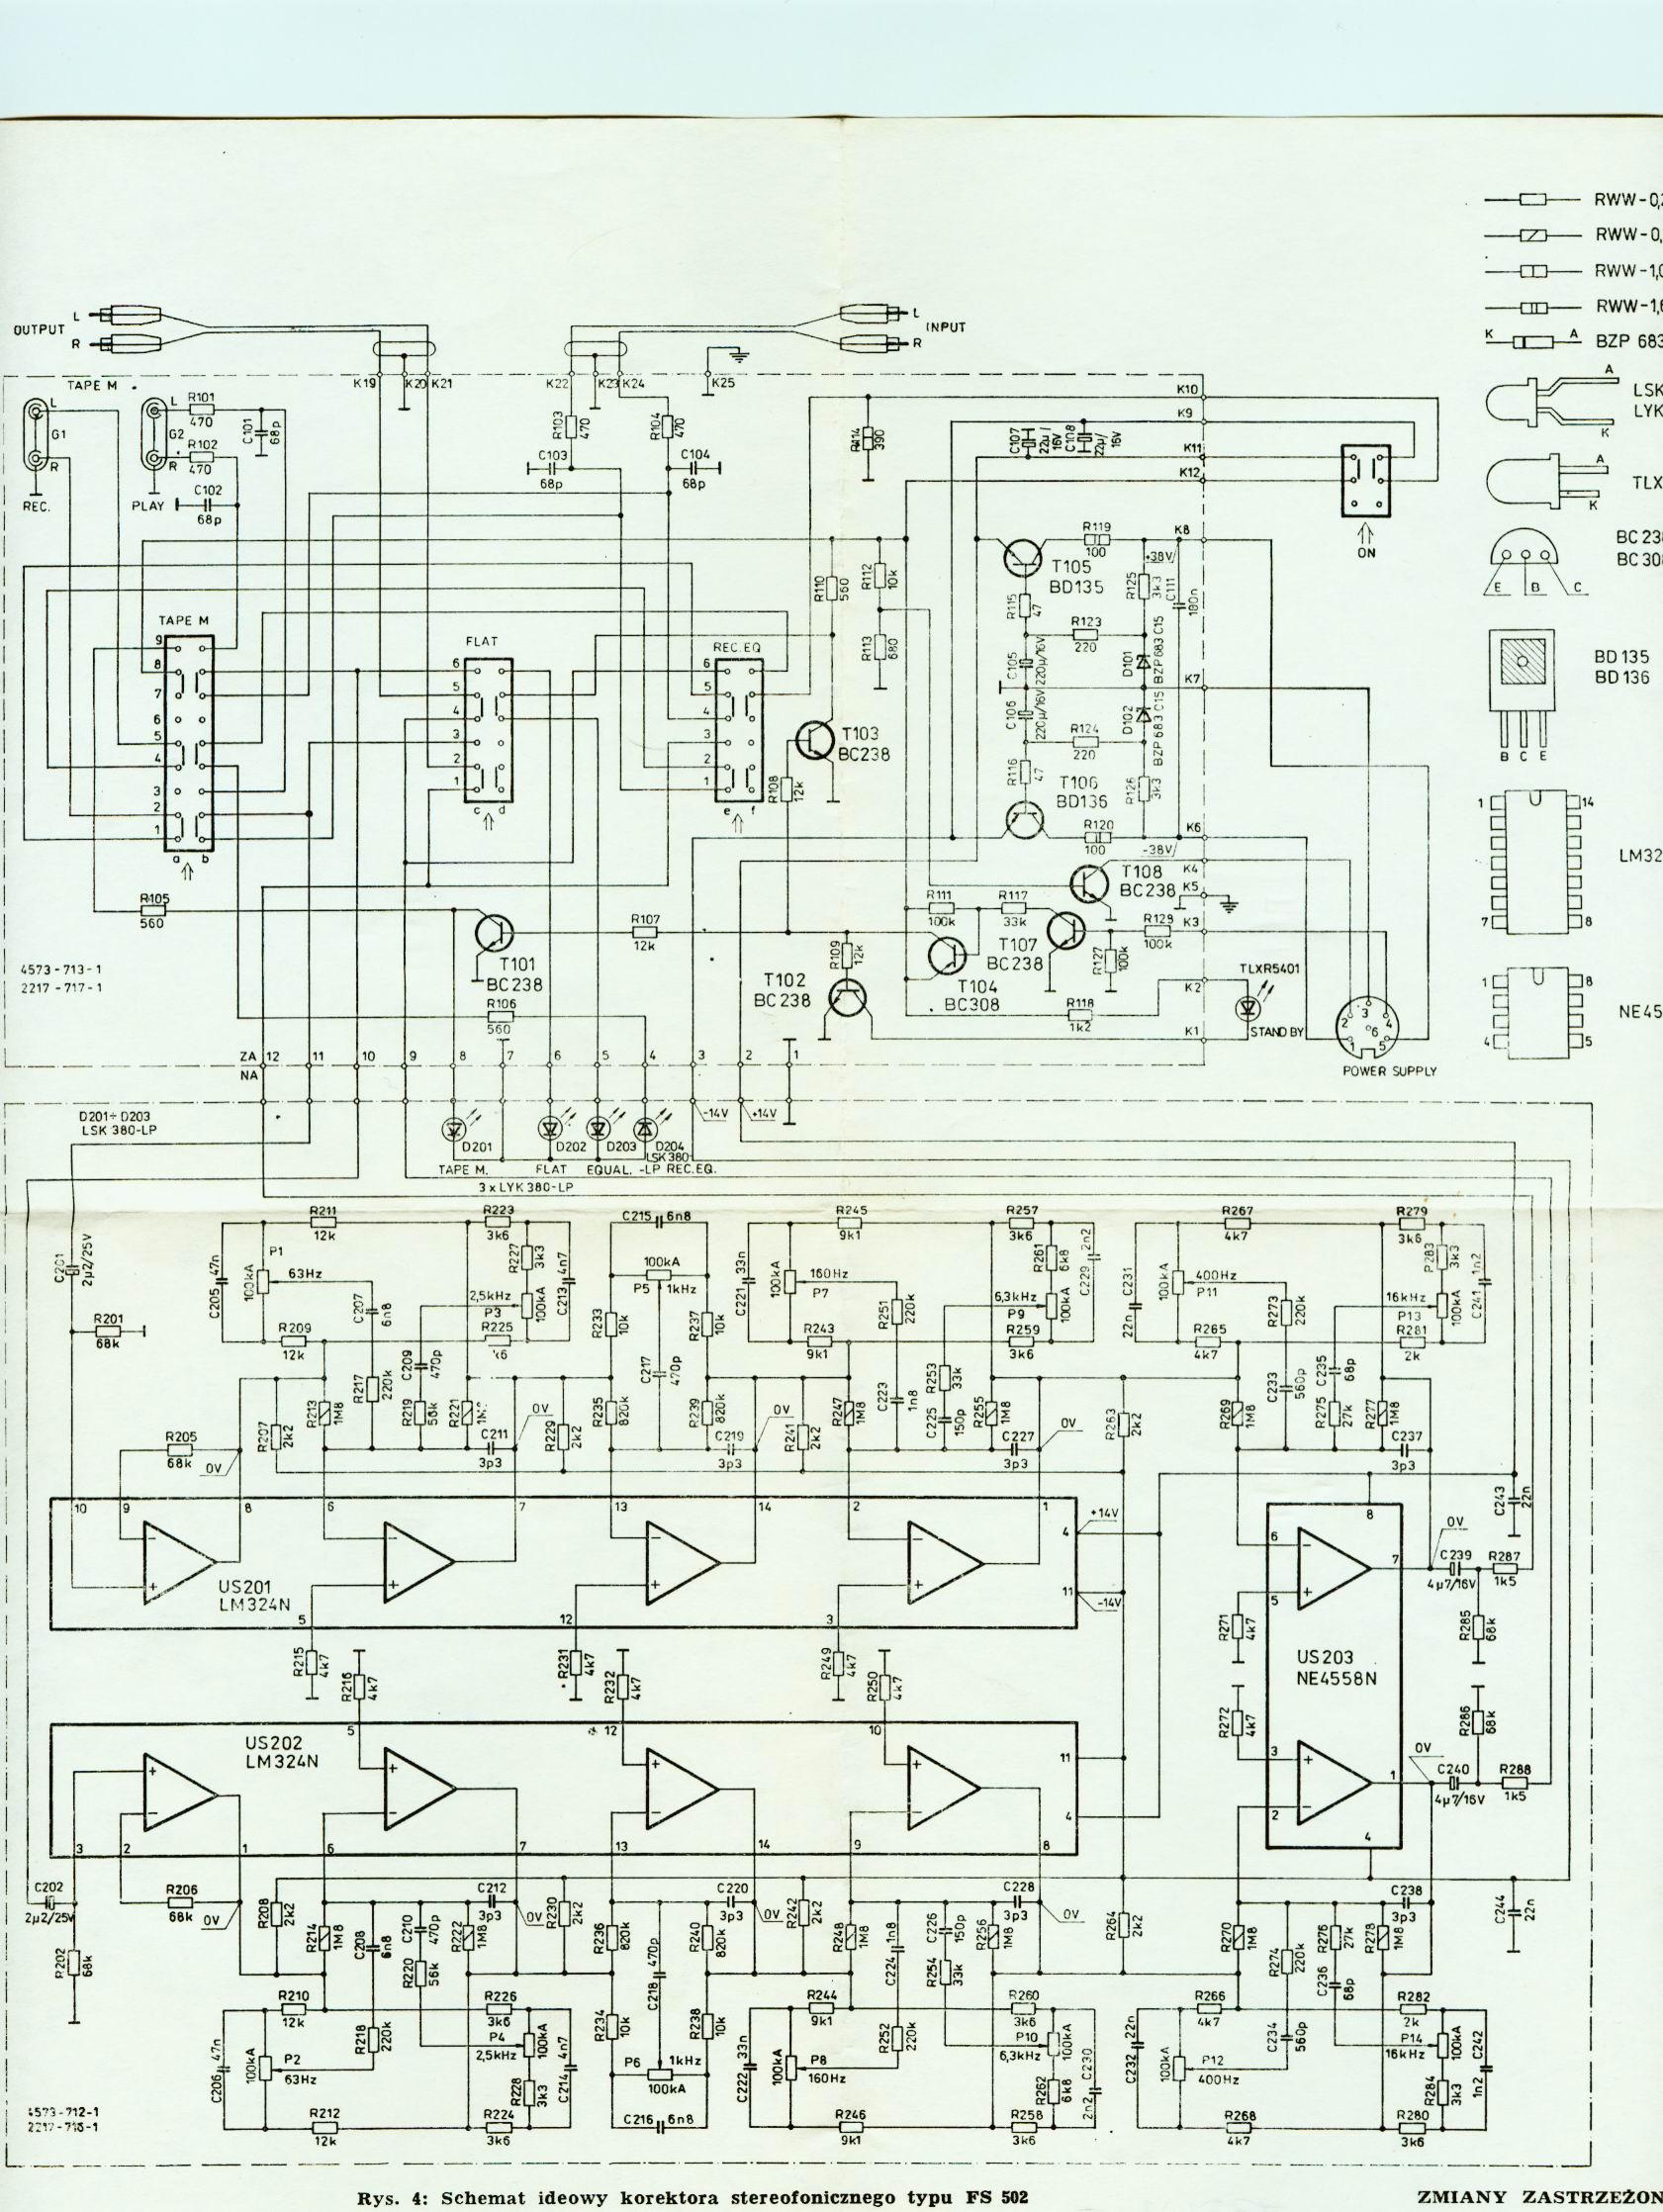 Korektor Diora FS 502 nie dzia�a lewa korekcja